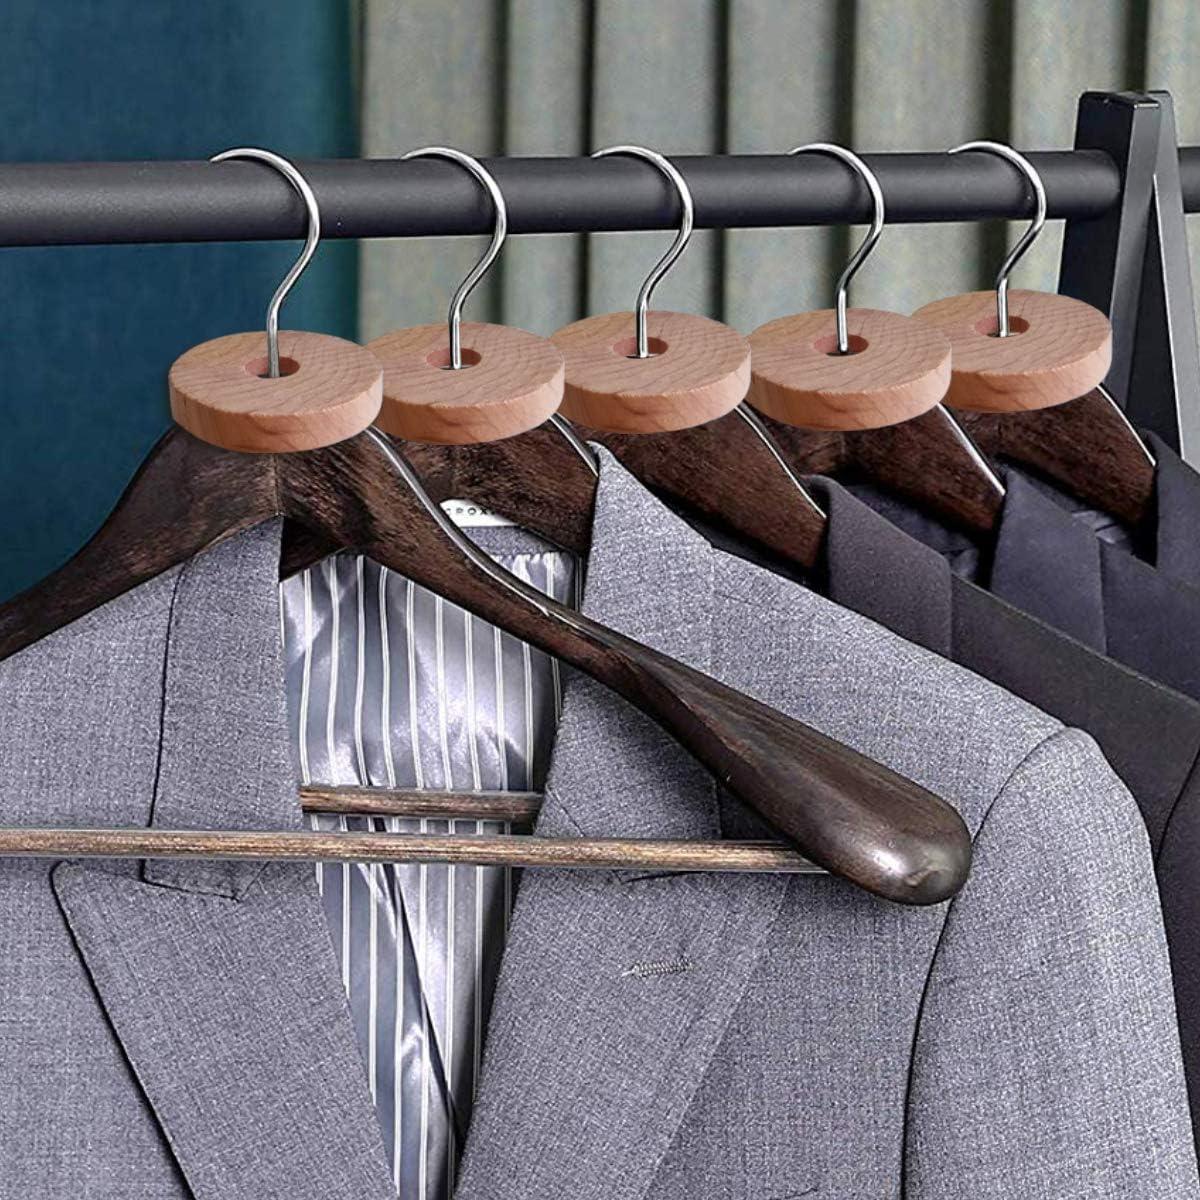 24 Cedar Rings and 30 Cedar Balls Cedar Rounds Disks Blocks for Closets Drawers Pengpet Cedar Rings Balls for Clothes Storage